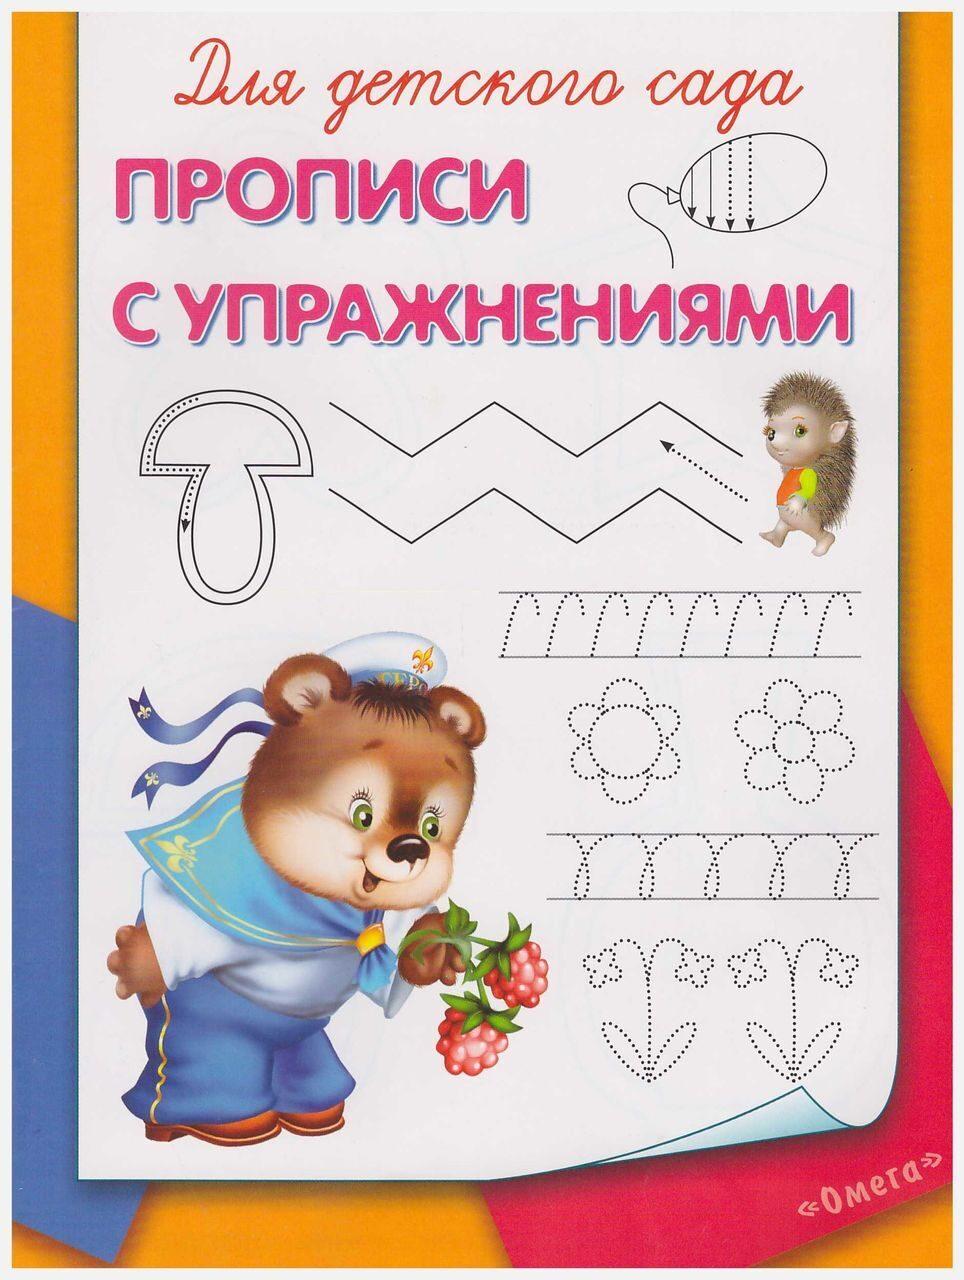 Прописи для ребенка своими руками